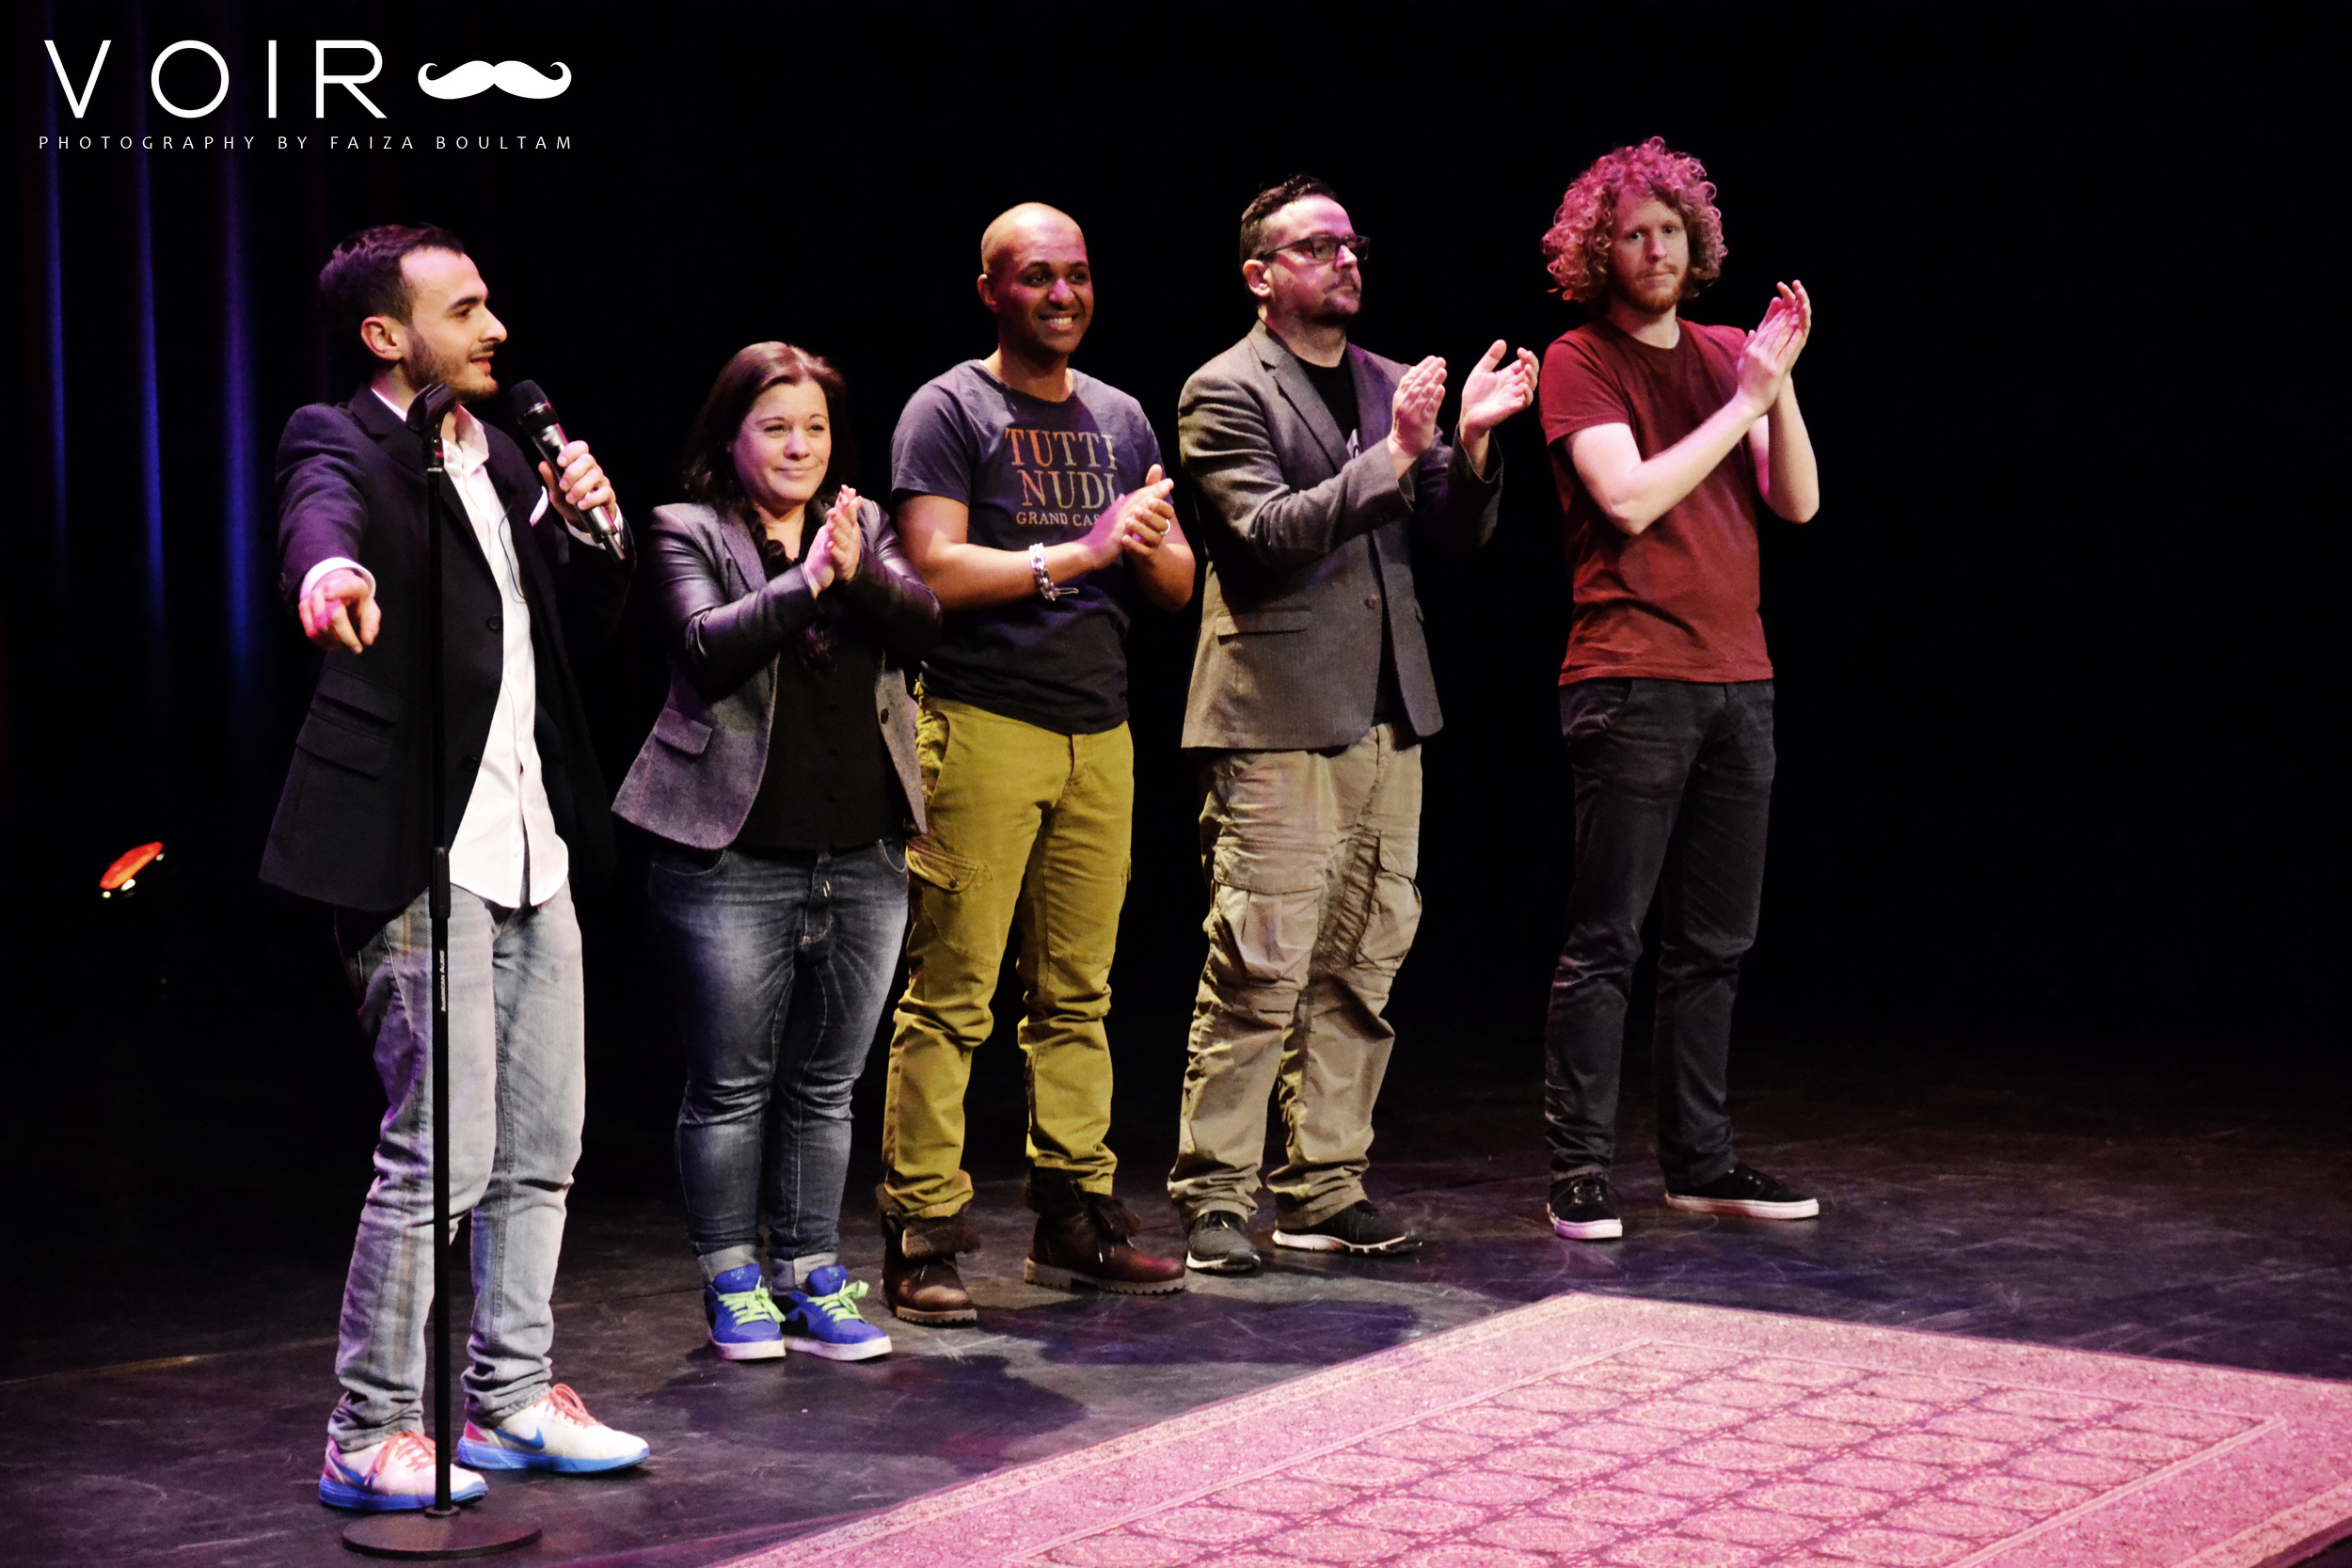 Farbod Moghaddam, Berit Companje, Samir Fighil, Arie Koomen, Kasper van der Laan